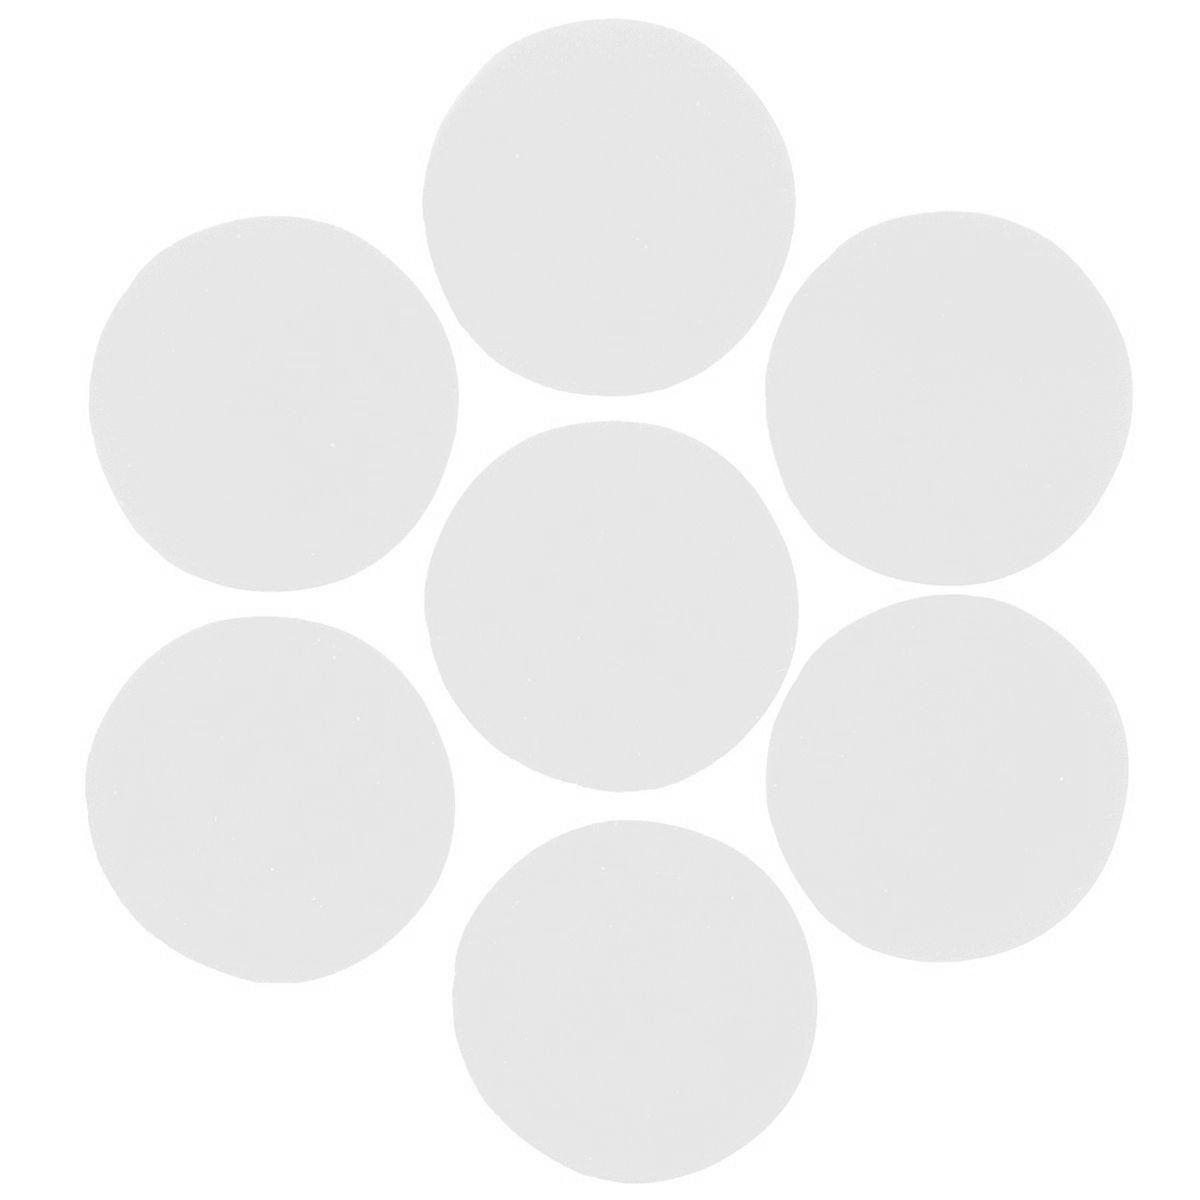 Конфетти кружочки белые 23мм, 1кг